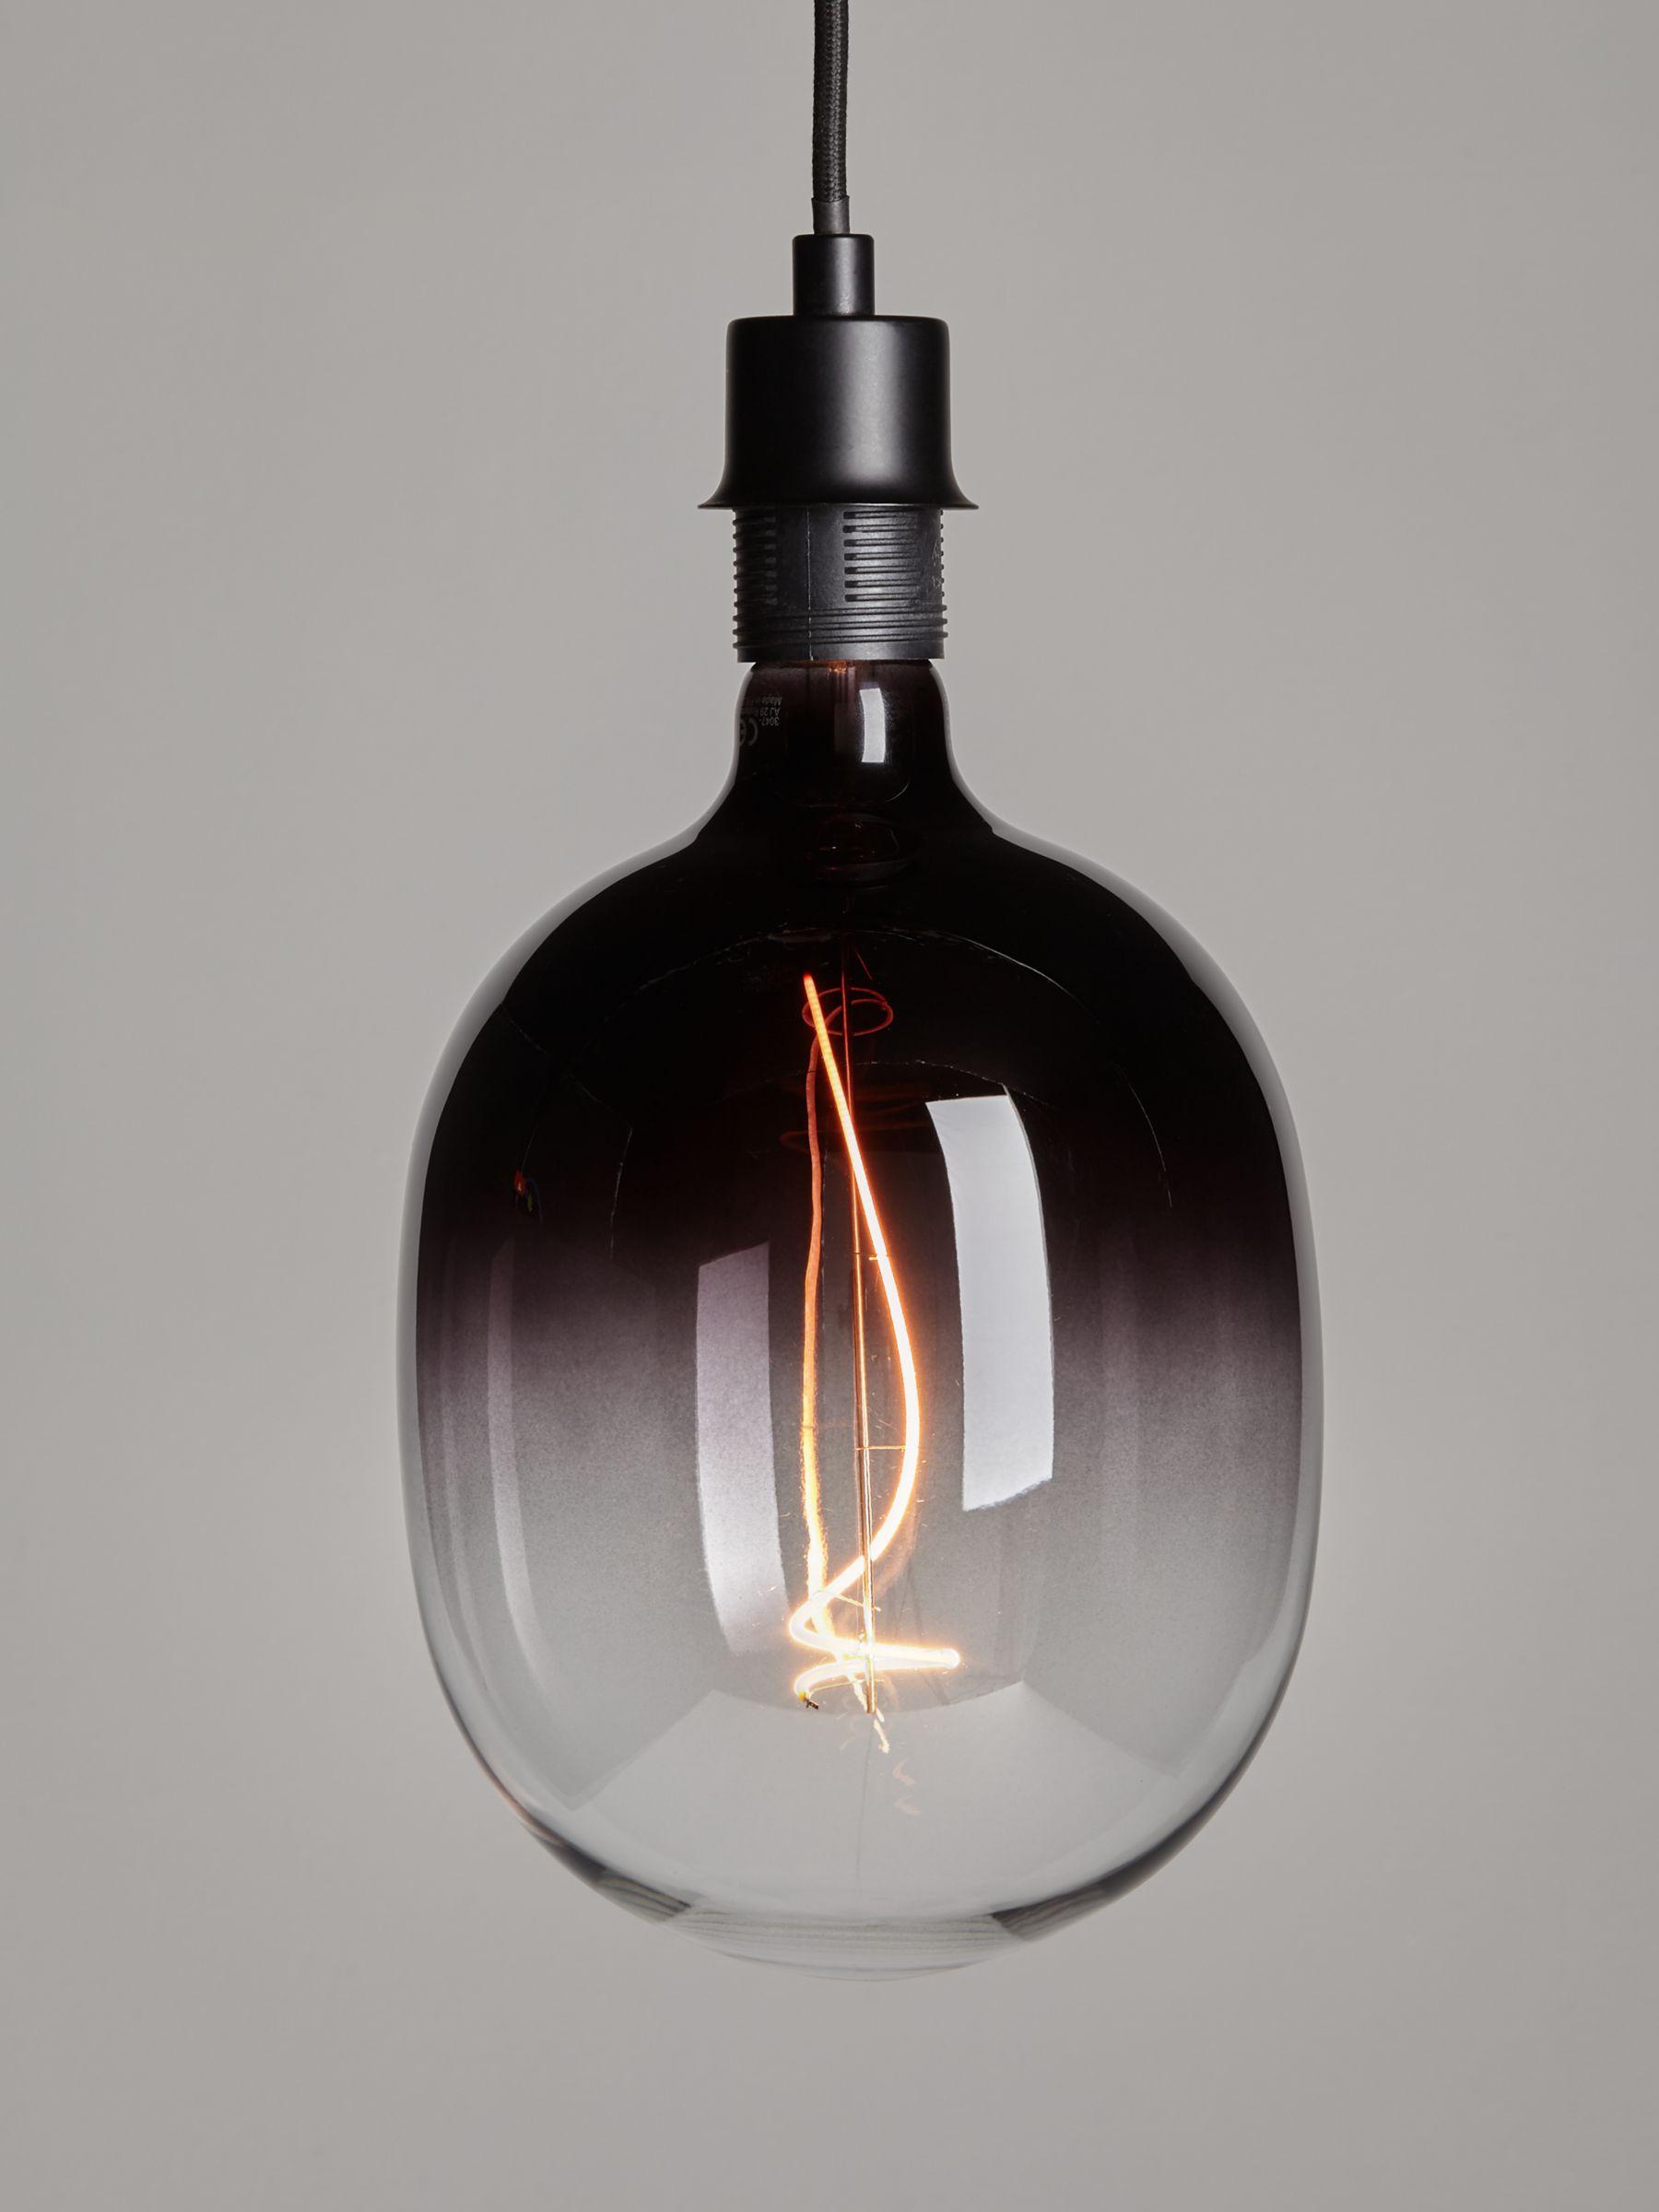 Calex Calex Avesta 4W ES LED Dimmable Filament Bulb, Moonstone